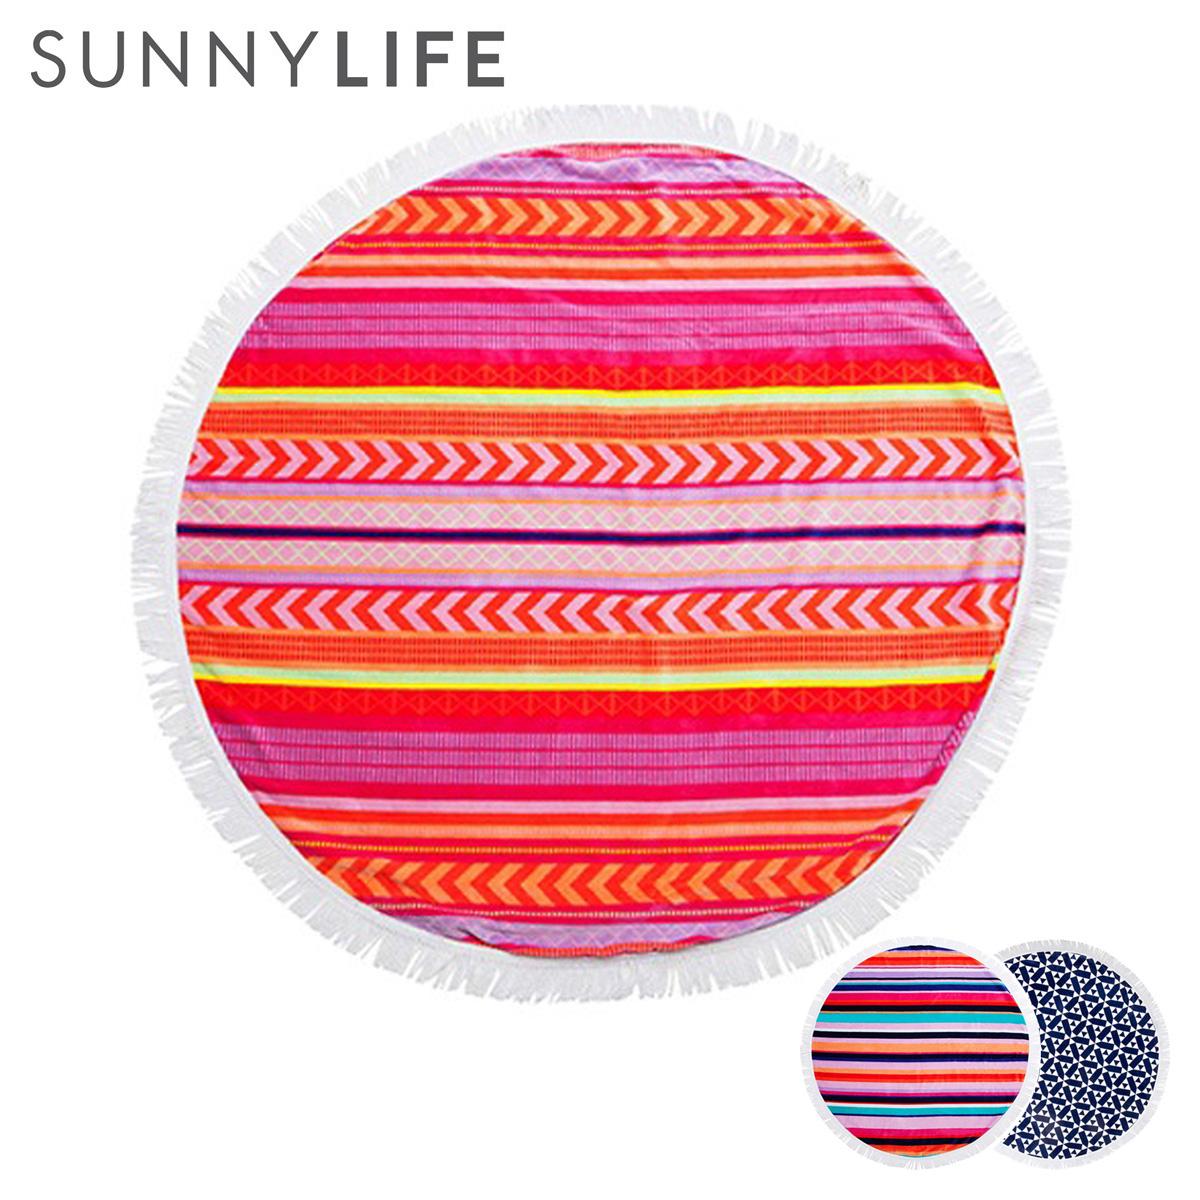 Allsports Sunny Life Sunnylife Round Beach Towel Beach Mat Towel